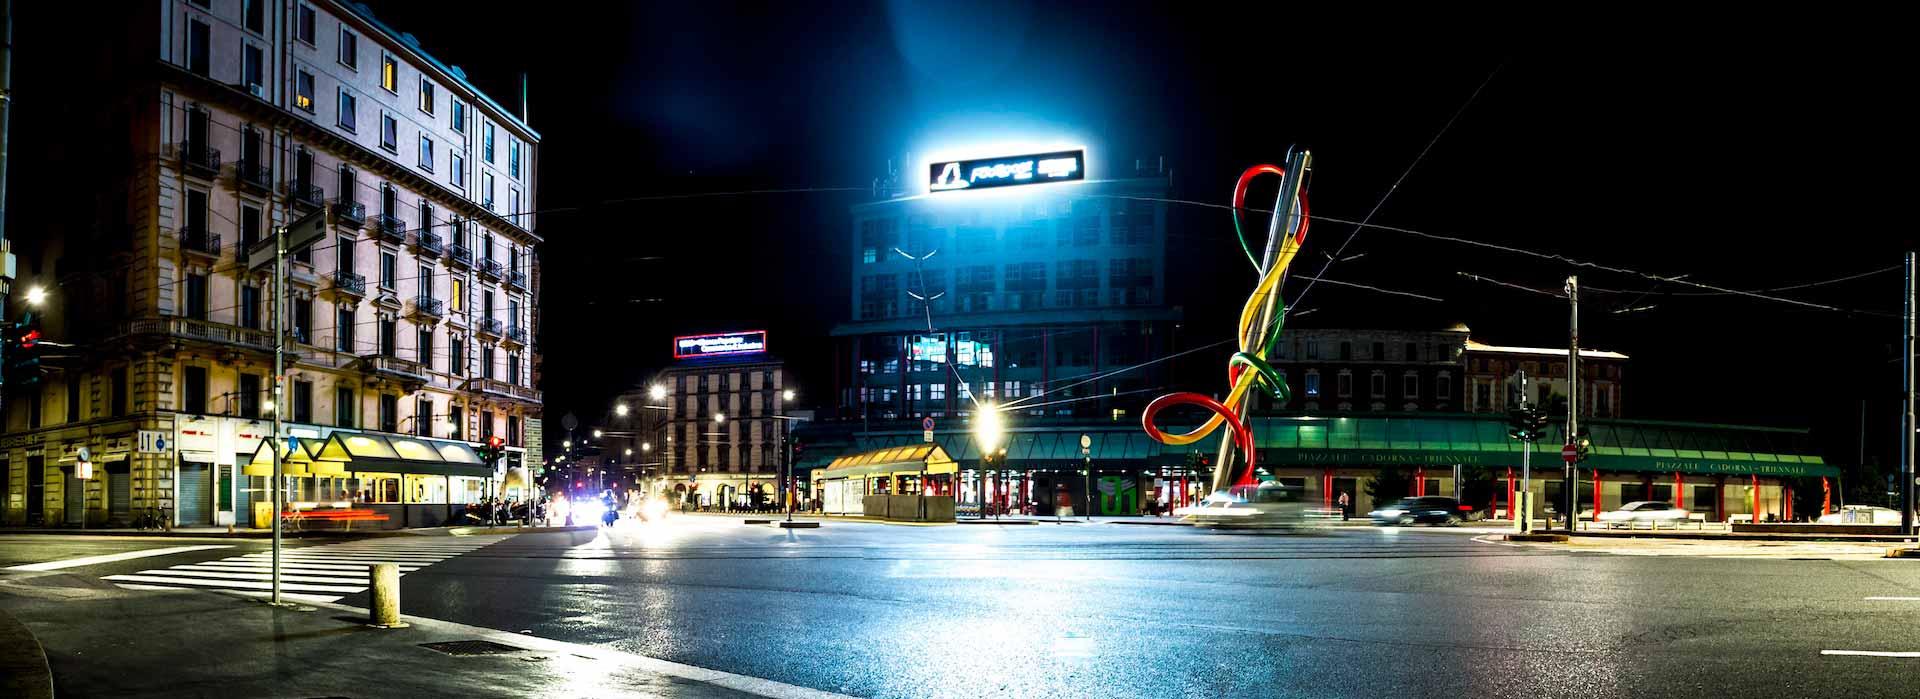 Led display su tetto piazza cadorna Milano